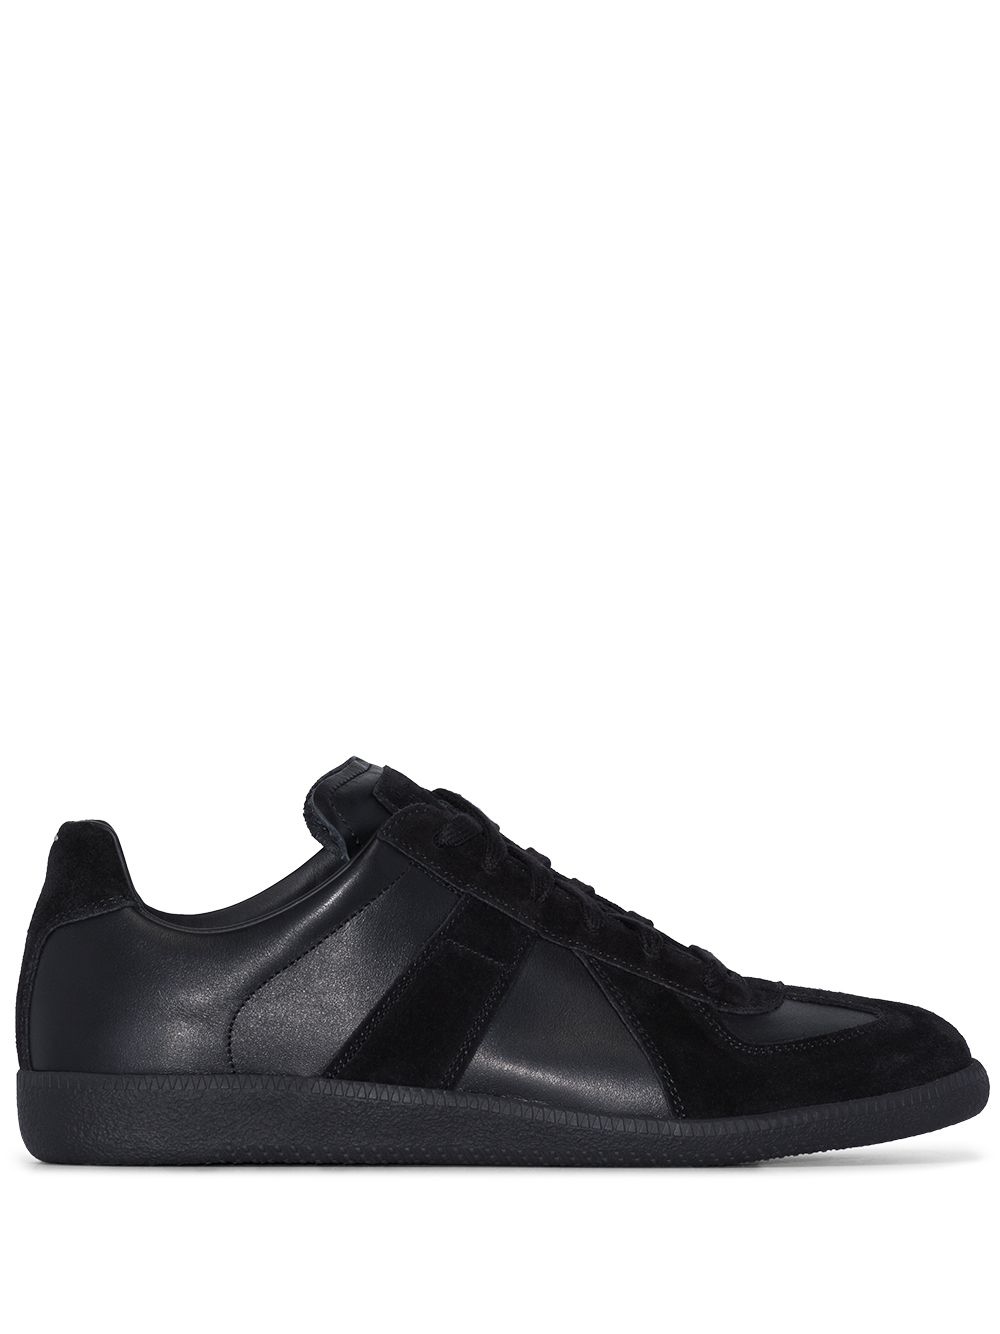 Maison Margiela sneakers replica uomo MAISON MARGIELA | Sneakers | S57WS0236 P1897900